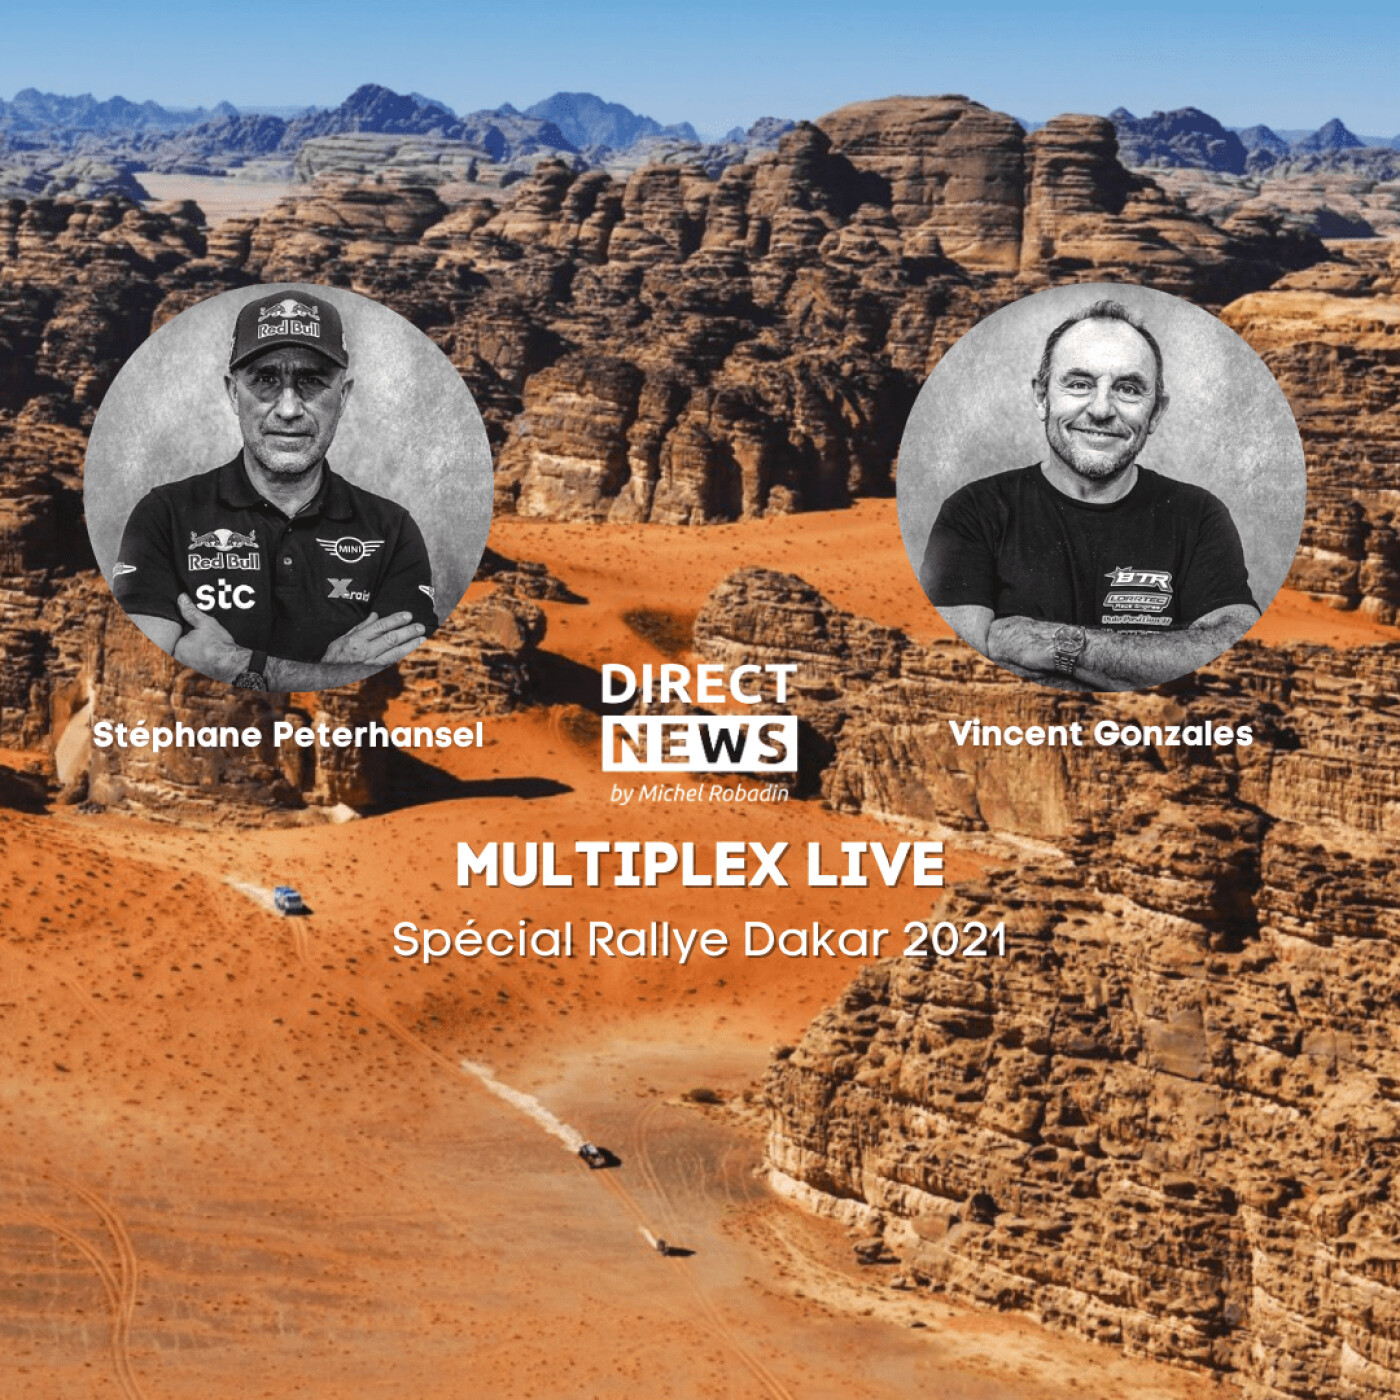 MultiplexLive Spécial Dakar 2021